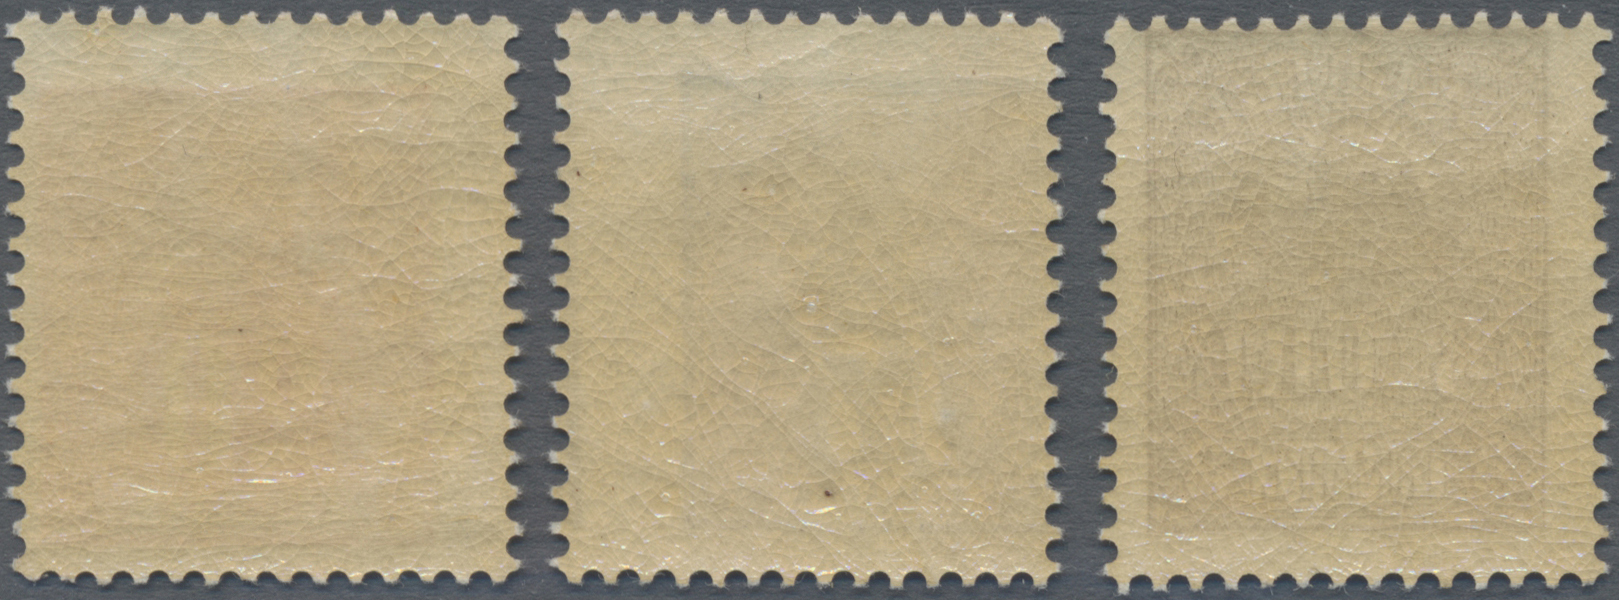 Lot 14765 - schweden  -  Auktionshaus Christoph Gärtner GmbH & Co. KG Sale #47 Single lots: Asia, Thematics, Overseas, Europe